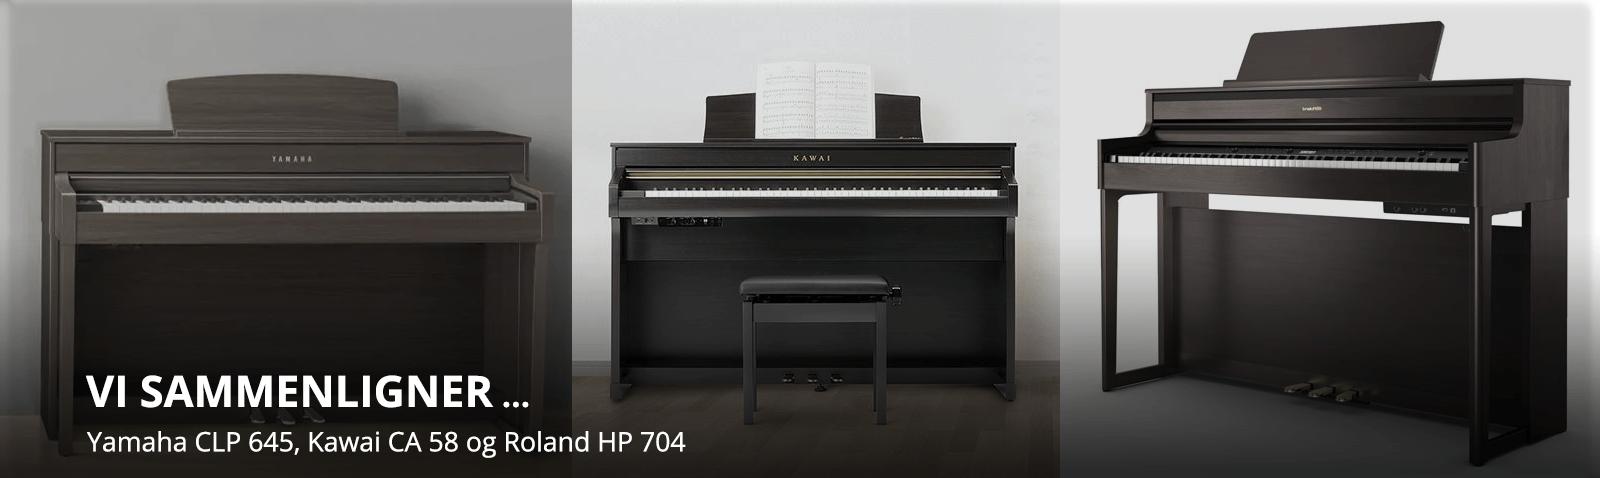 Sammenligning Yamaha CLP-645, Kawai CA-58 og Roland HP-704